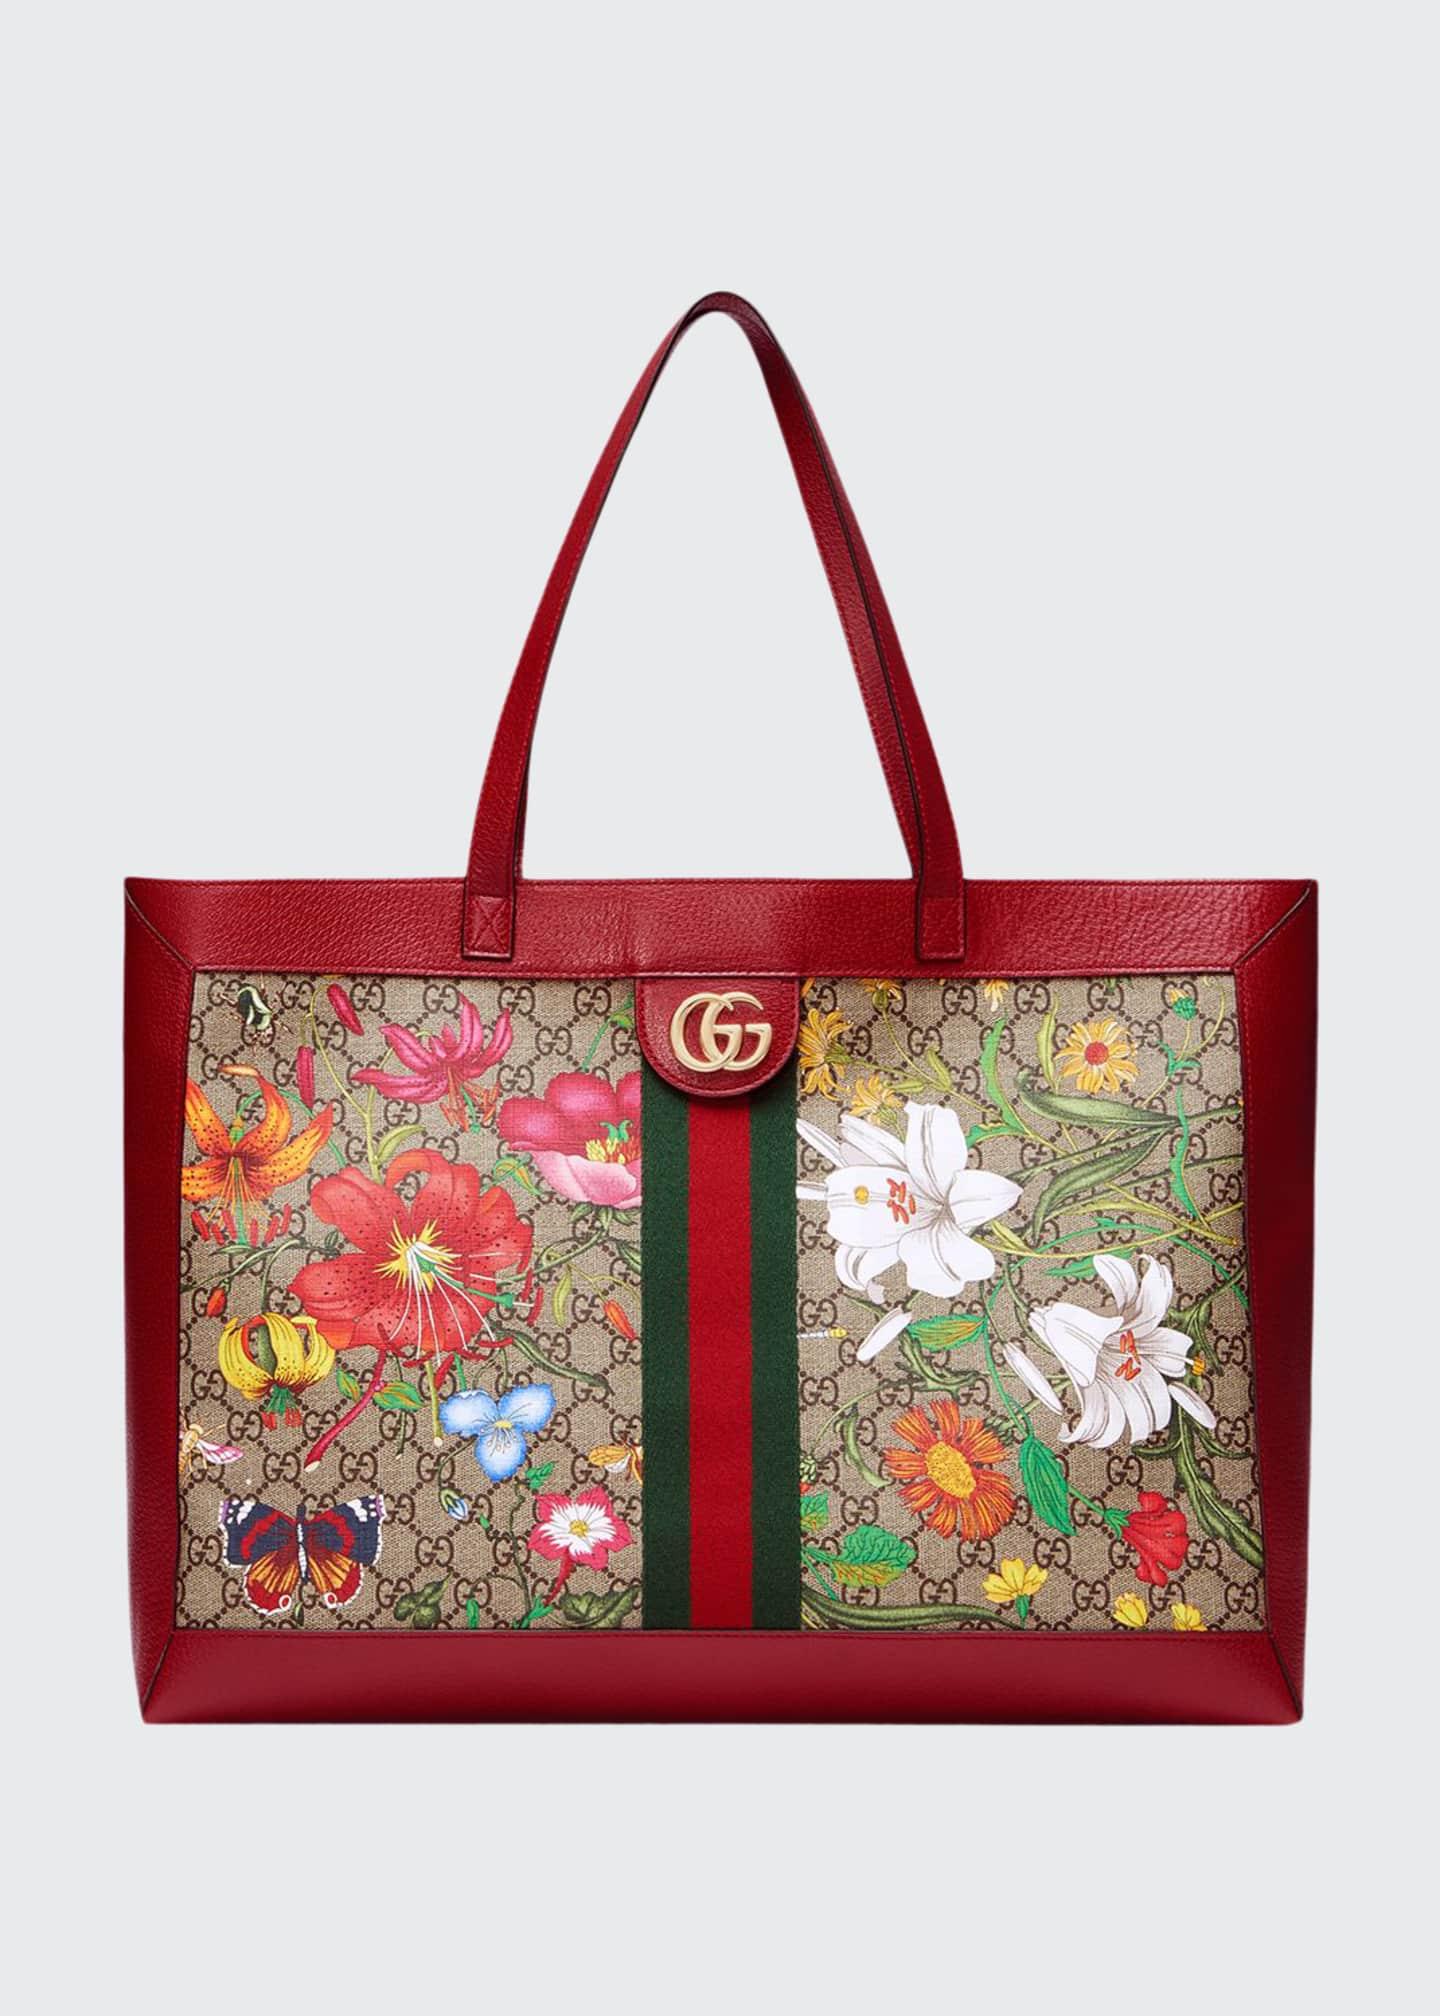 Gucci Ophidia Medium GG Flora Tote Bag